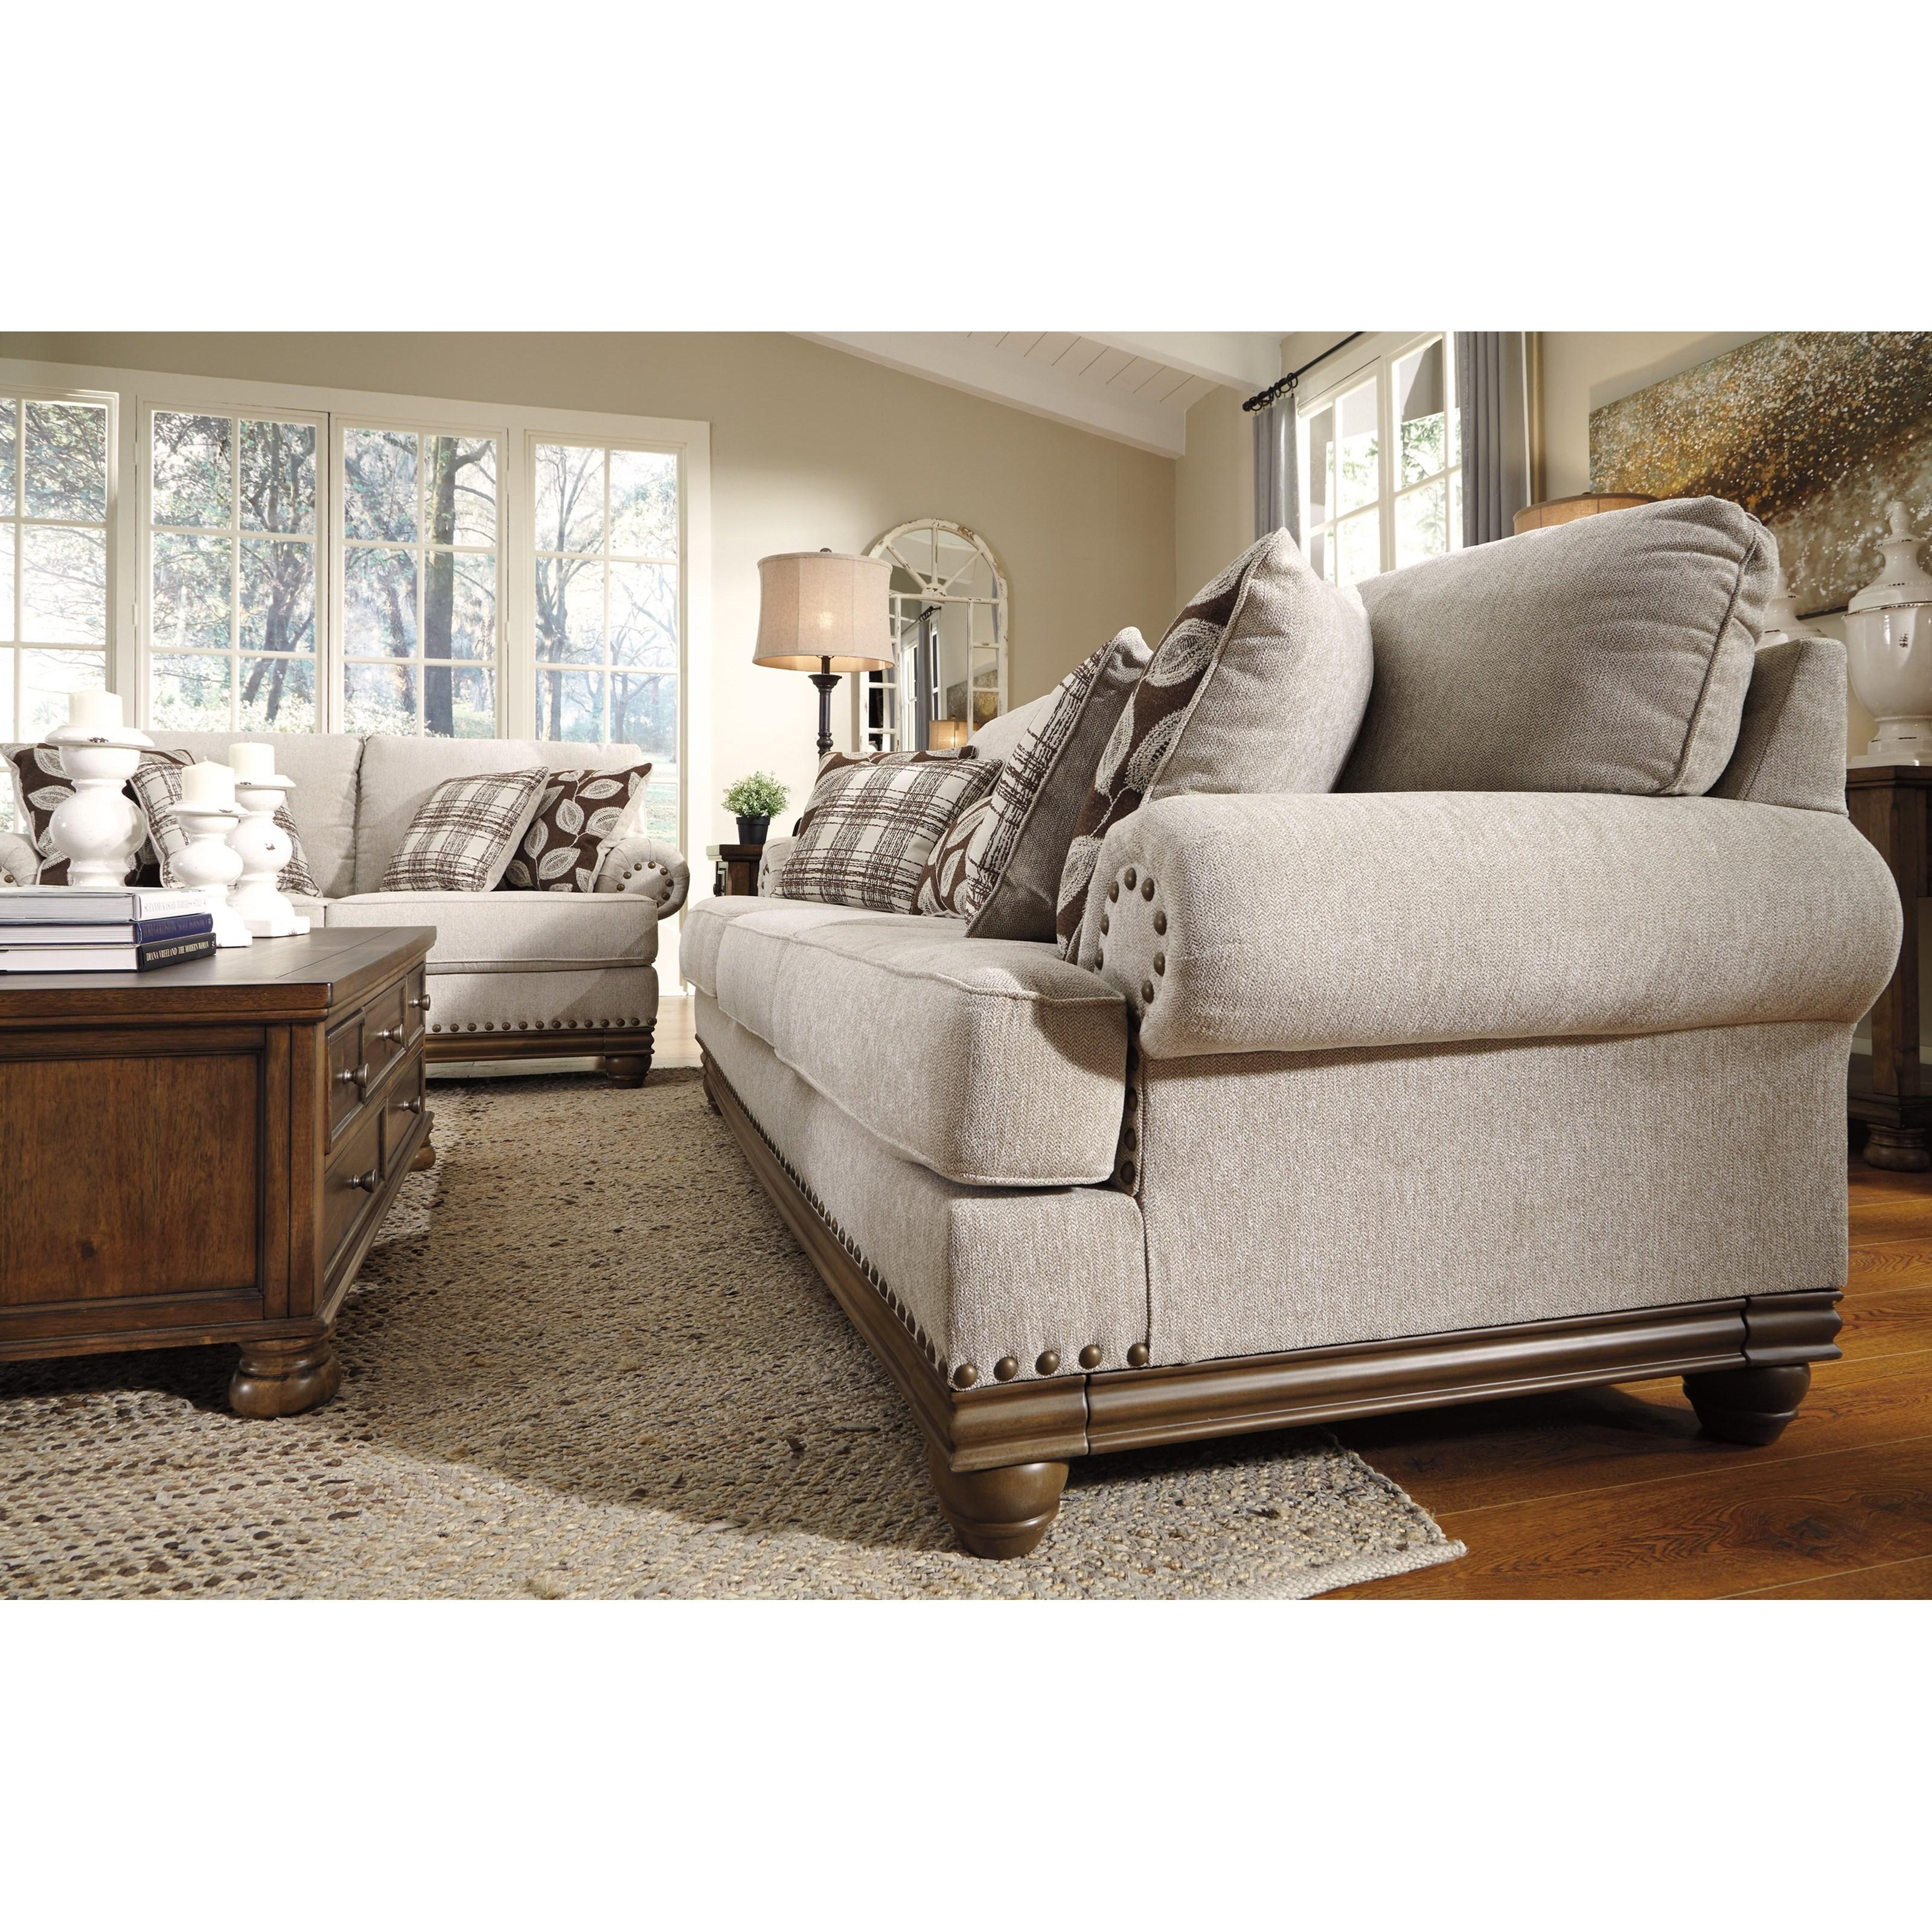 nailhead trim sofa ashley blue leather on sale signature design harleson 1510438 transitional